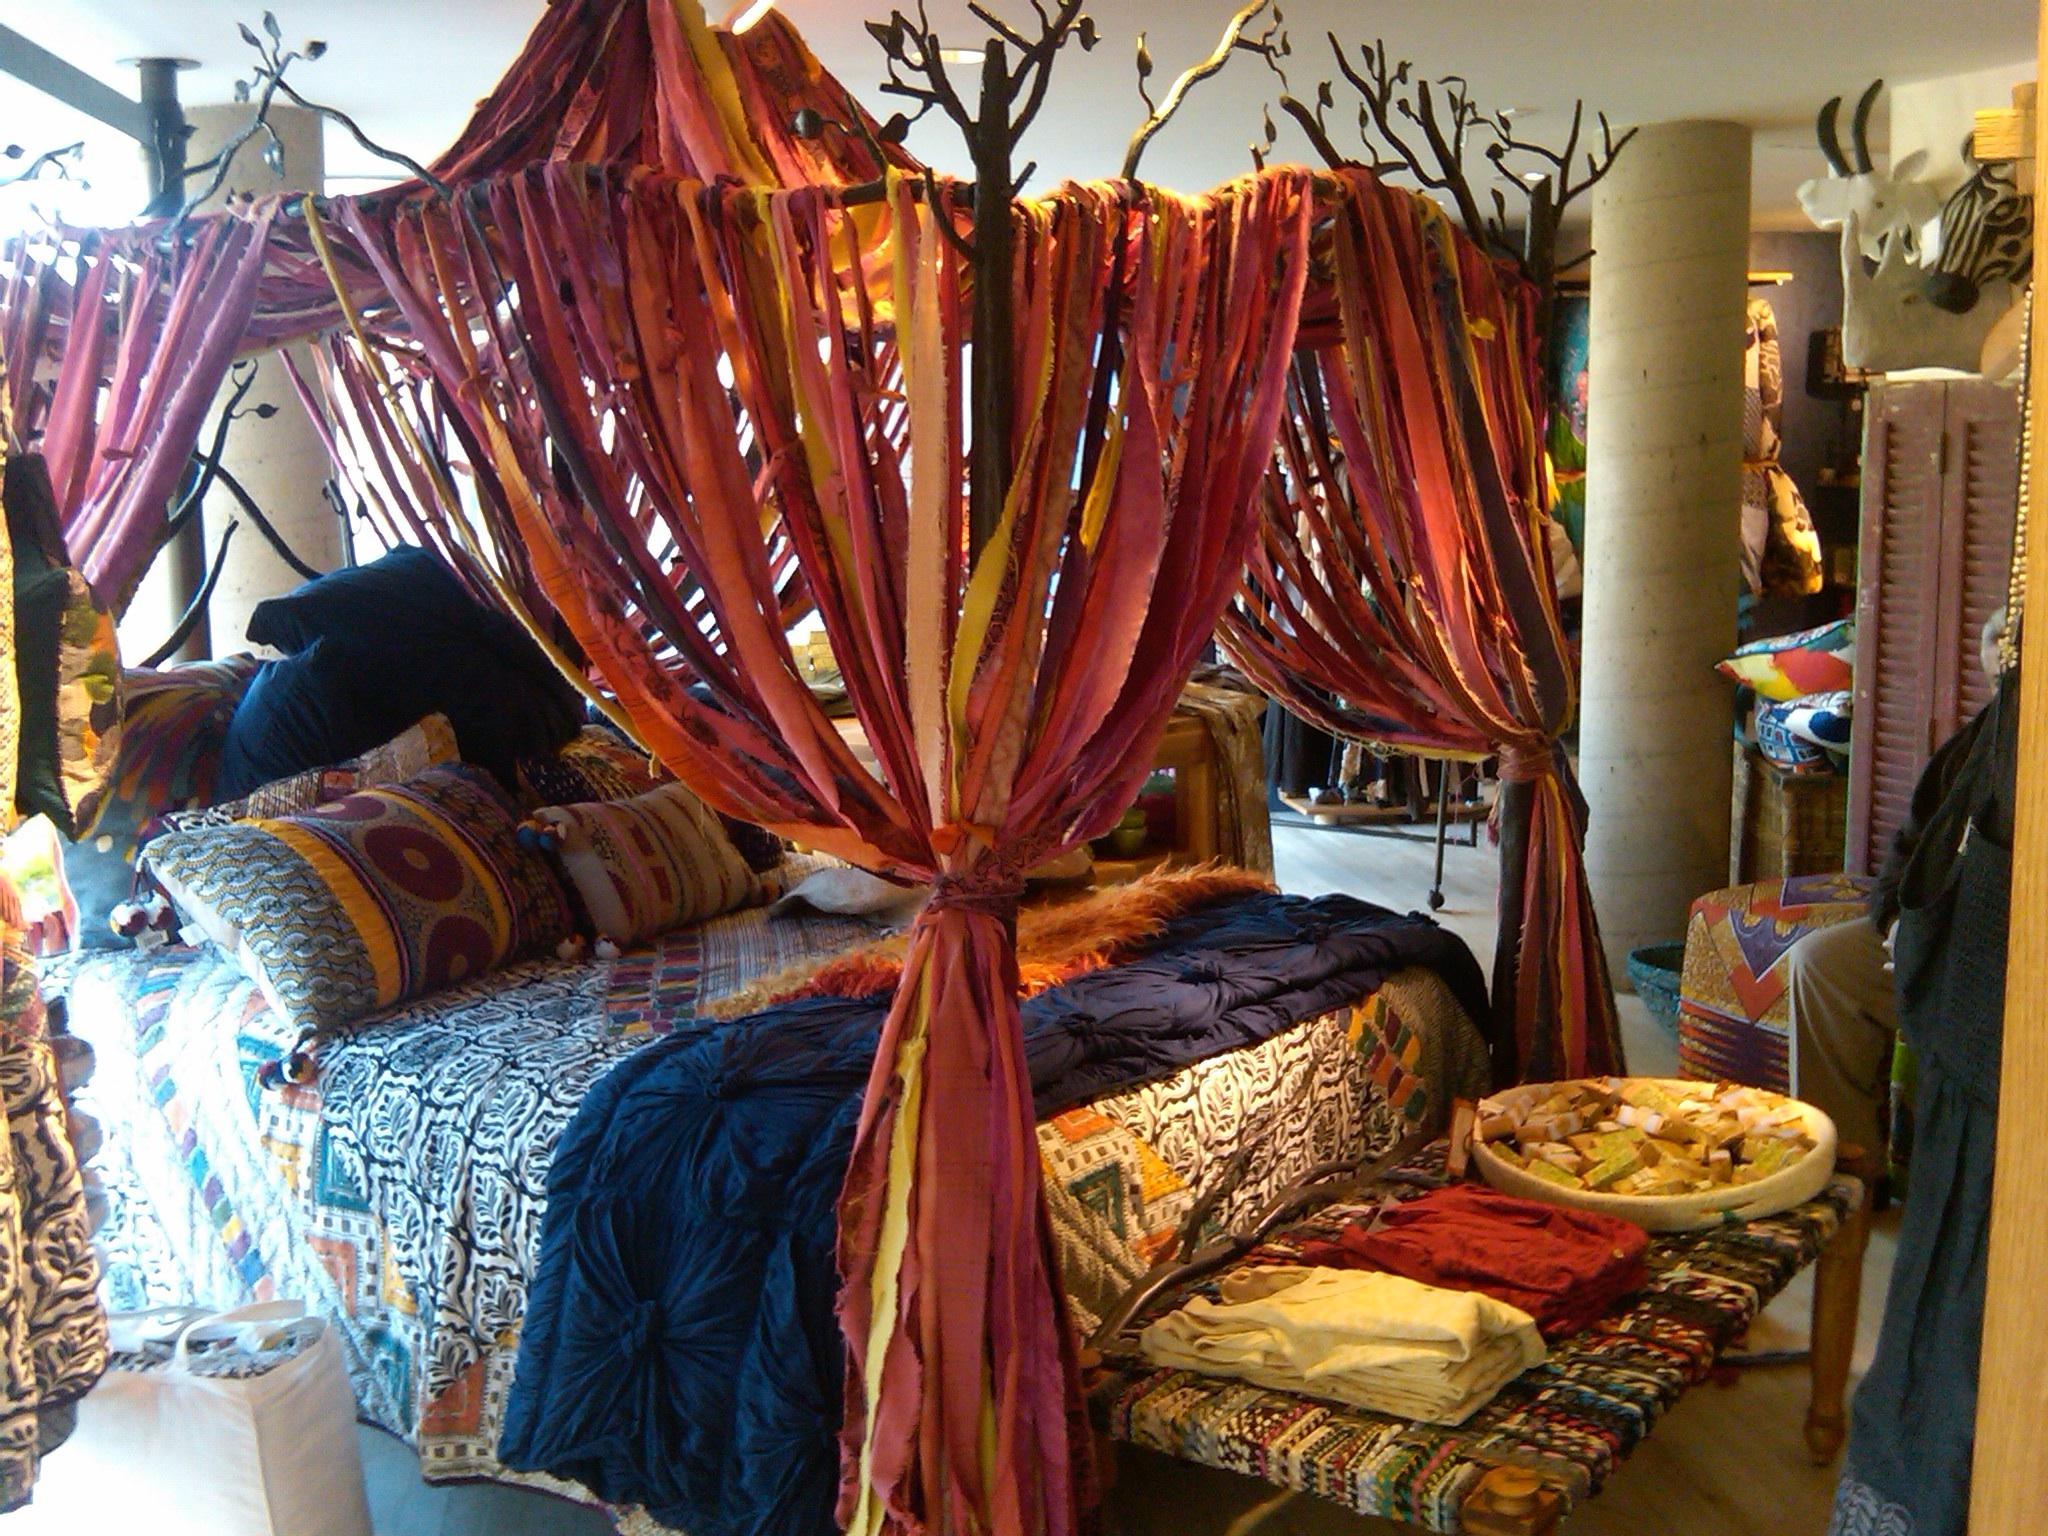 Bohemian Style Bedroom Decorating Ideas | Royal Furnish on Bohemian Bedroom Ideas  id=30325